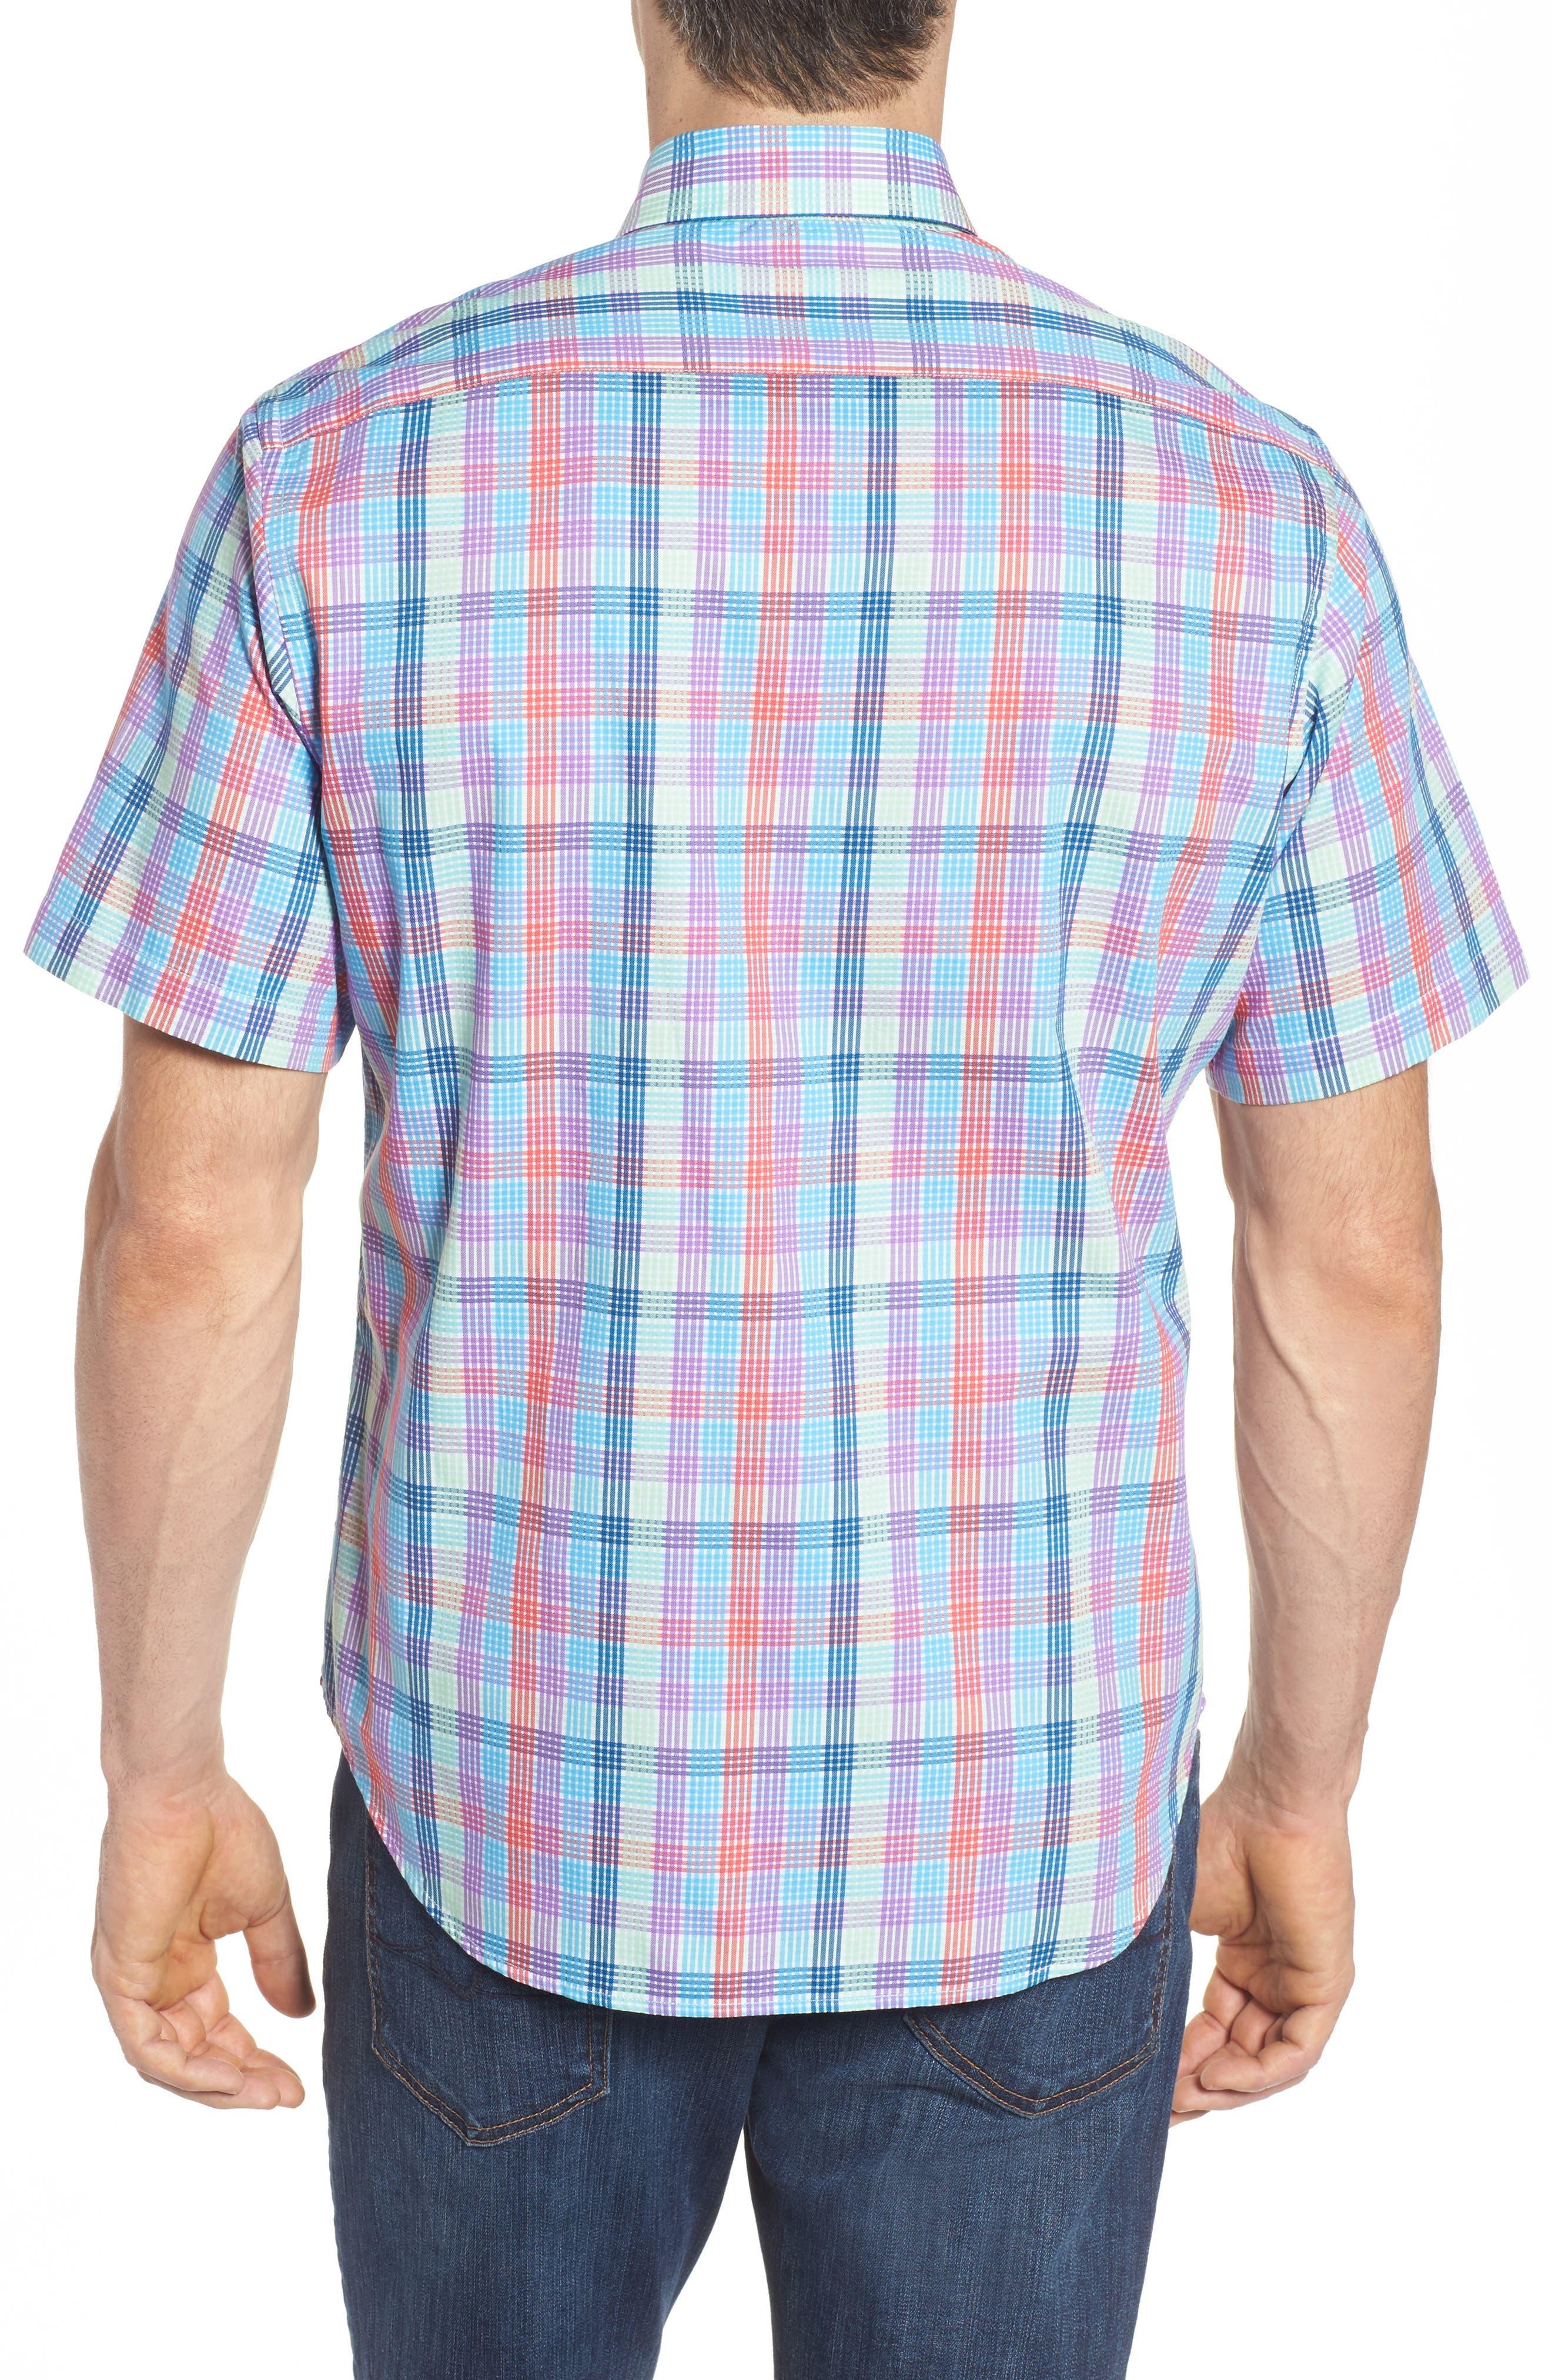 Alternate Image 2  - TailorByrd Slidell Regular Fit Check Sport Shirt